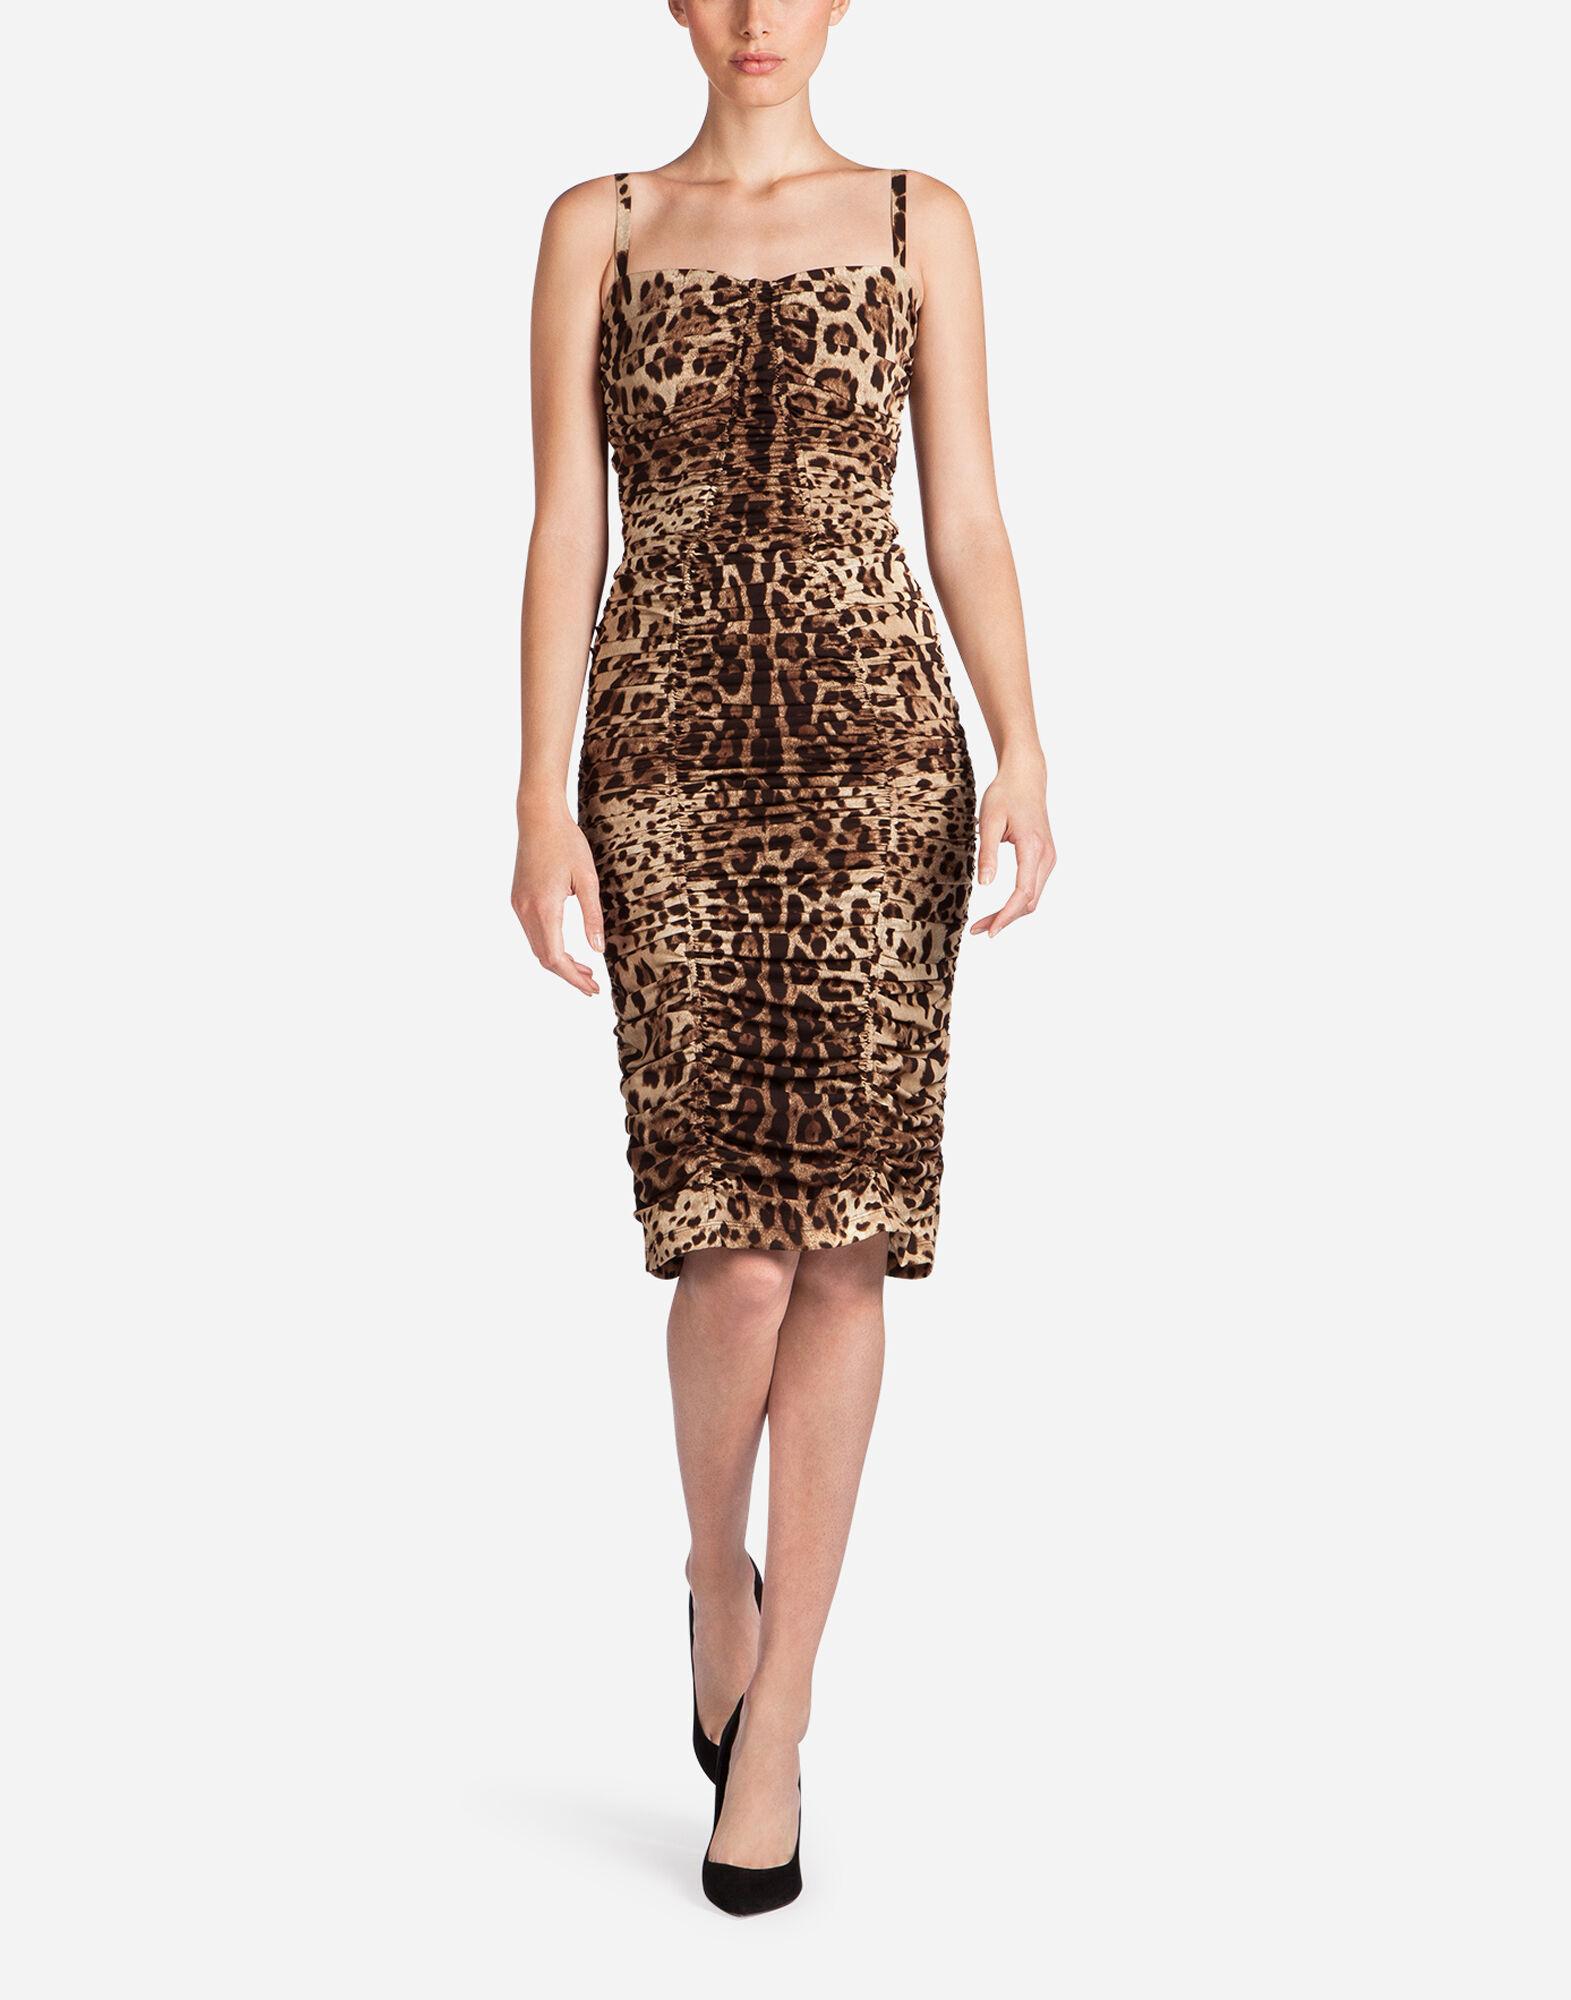 Women's dresses: clothing for women Dolce&Gabbana - LEOPARD PRINT ...